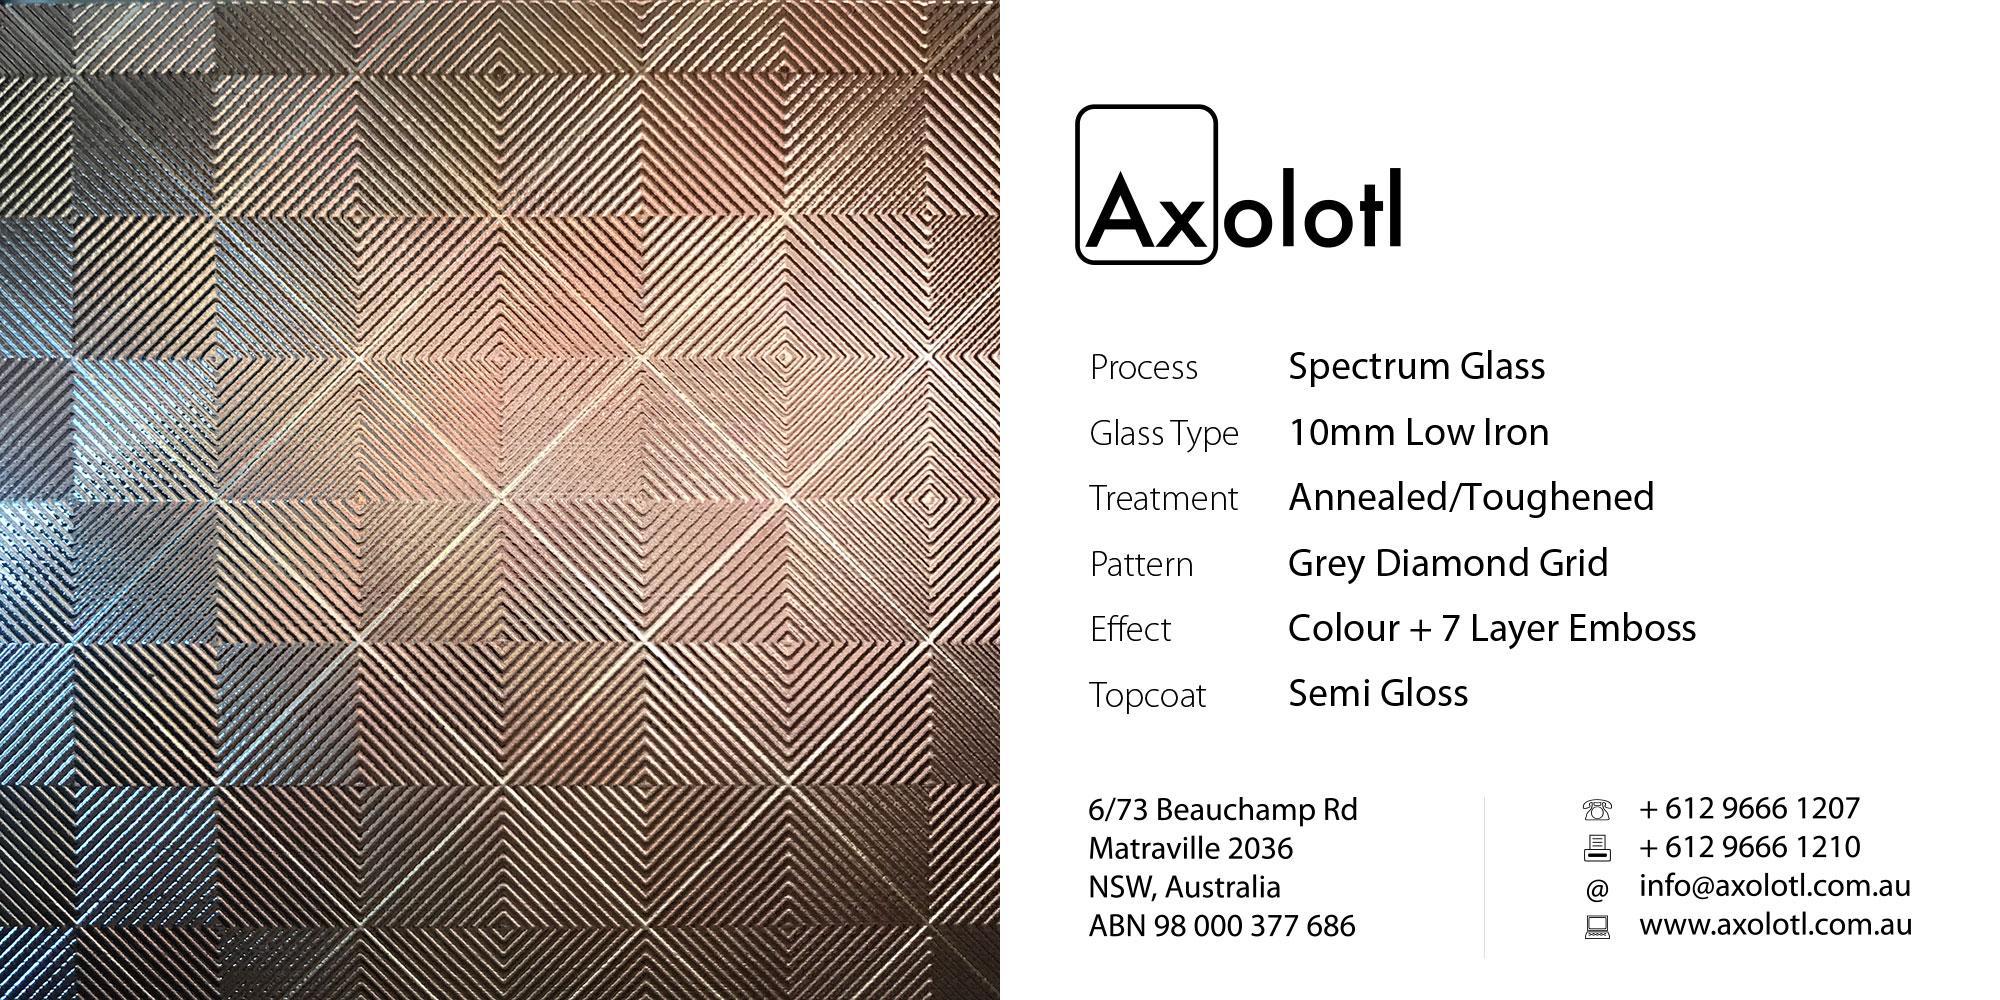 Axolotl_SpectrumGlass_GreyDiamonGrid.jpg